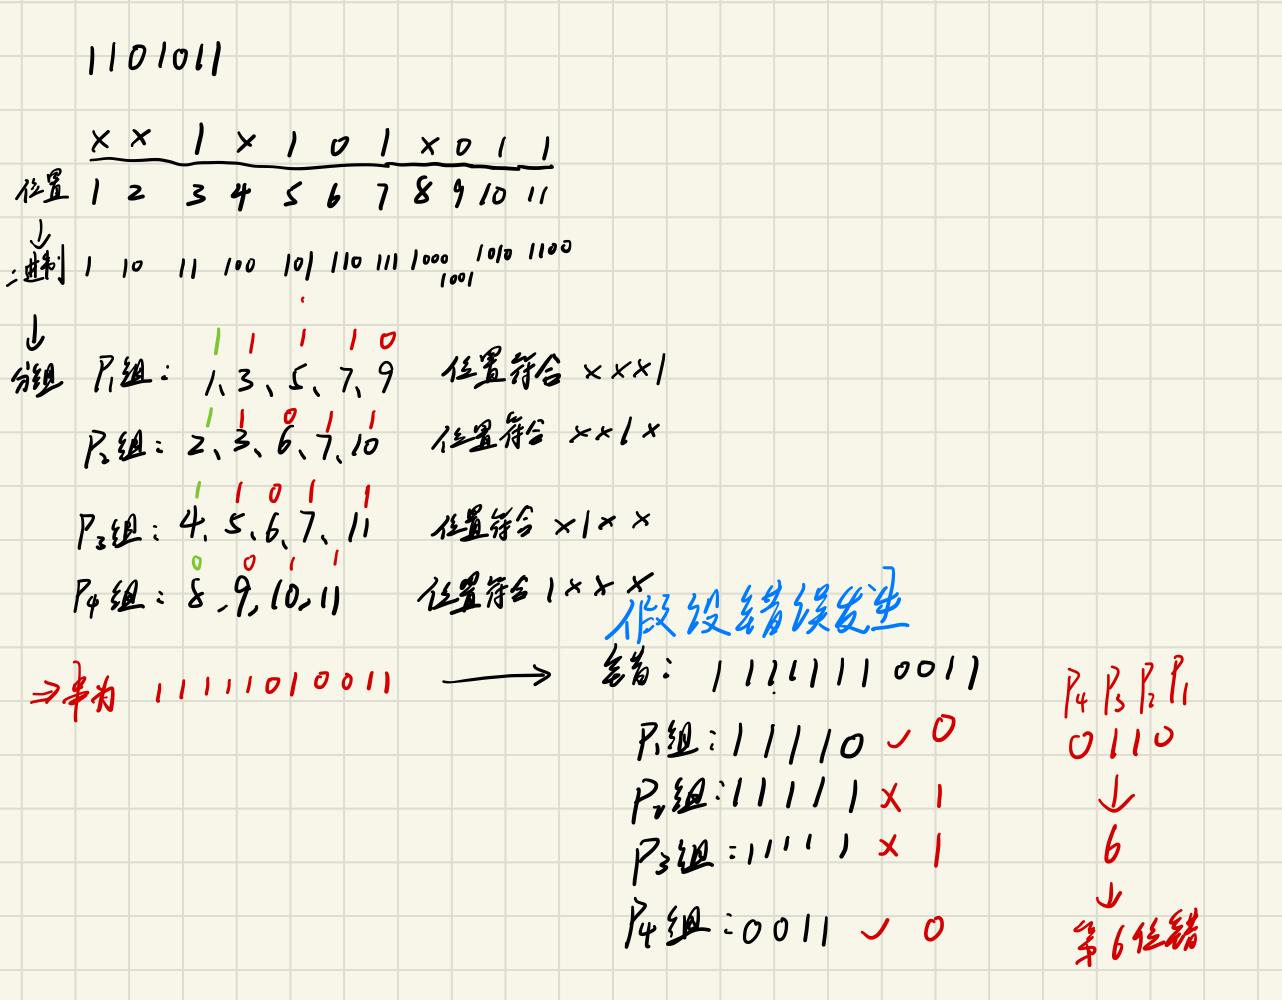 汉明码例子.png